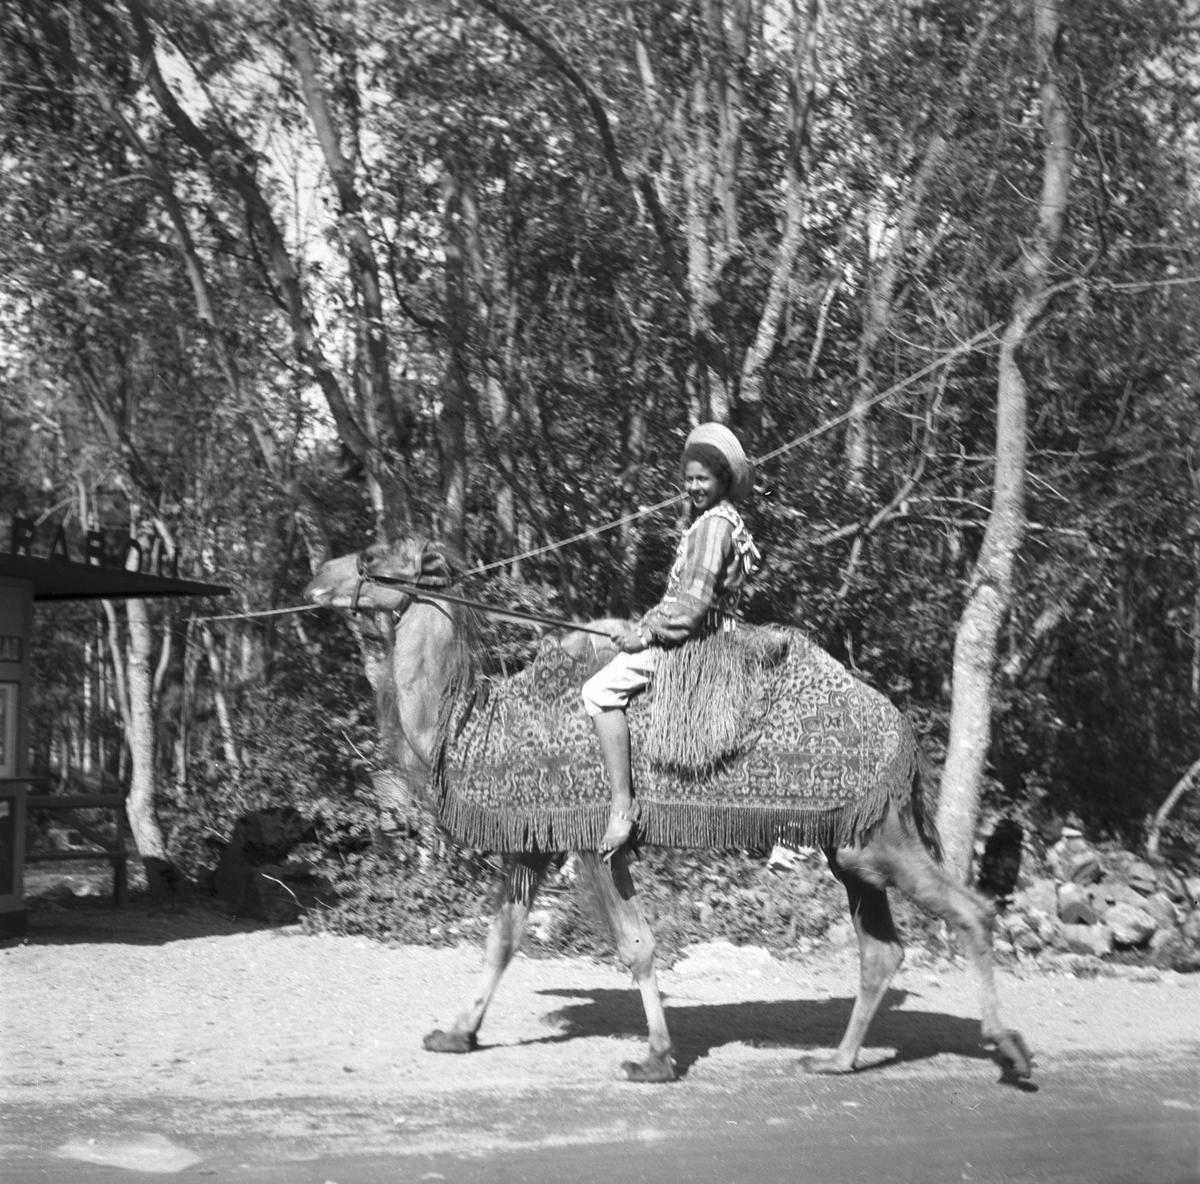 Furuvik. Kamel